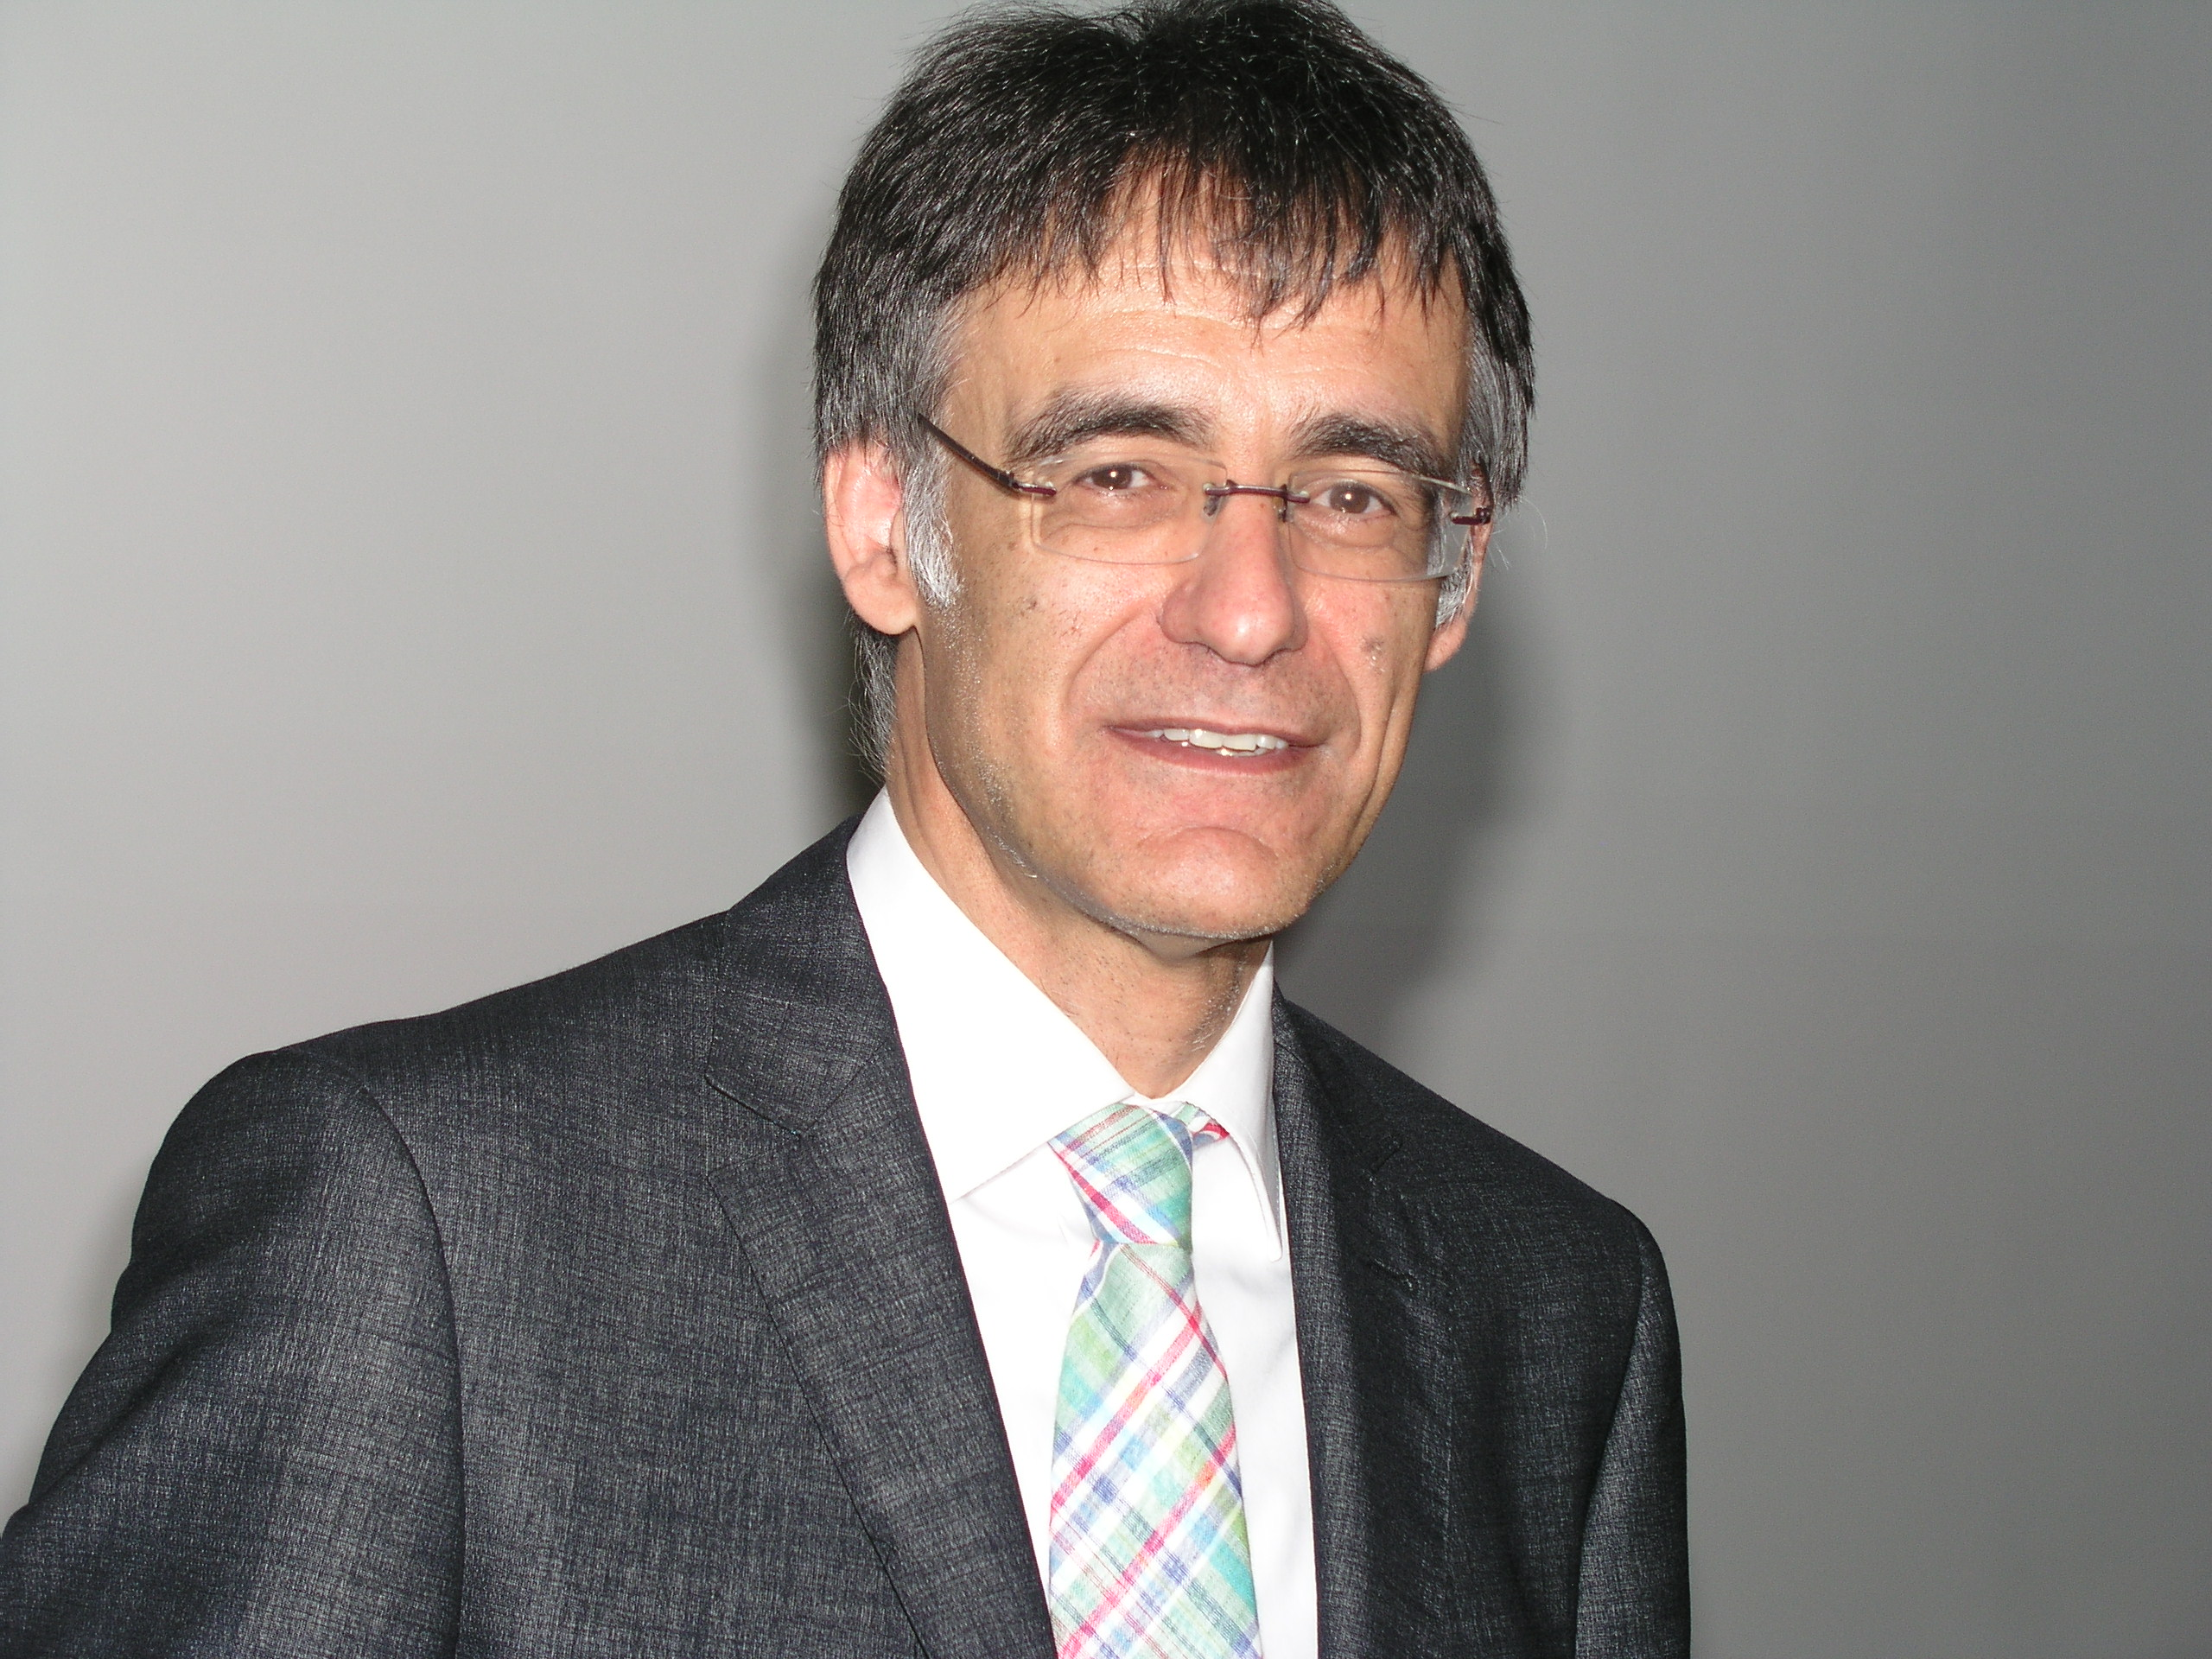 Prof. Dr. Gerd Häfner